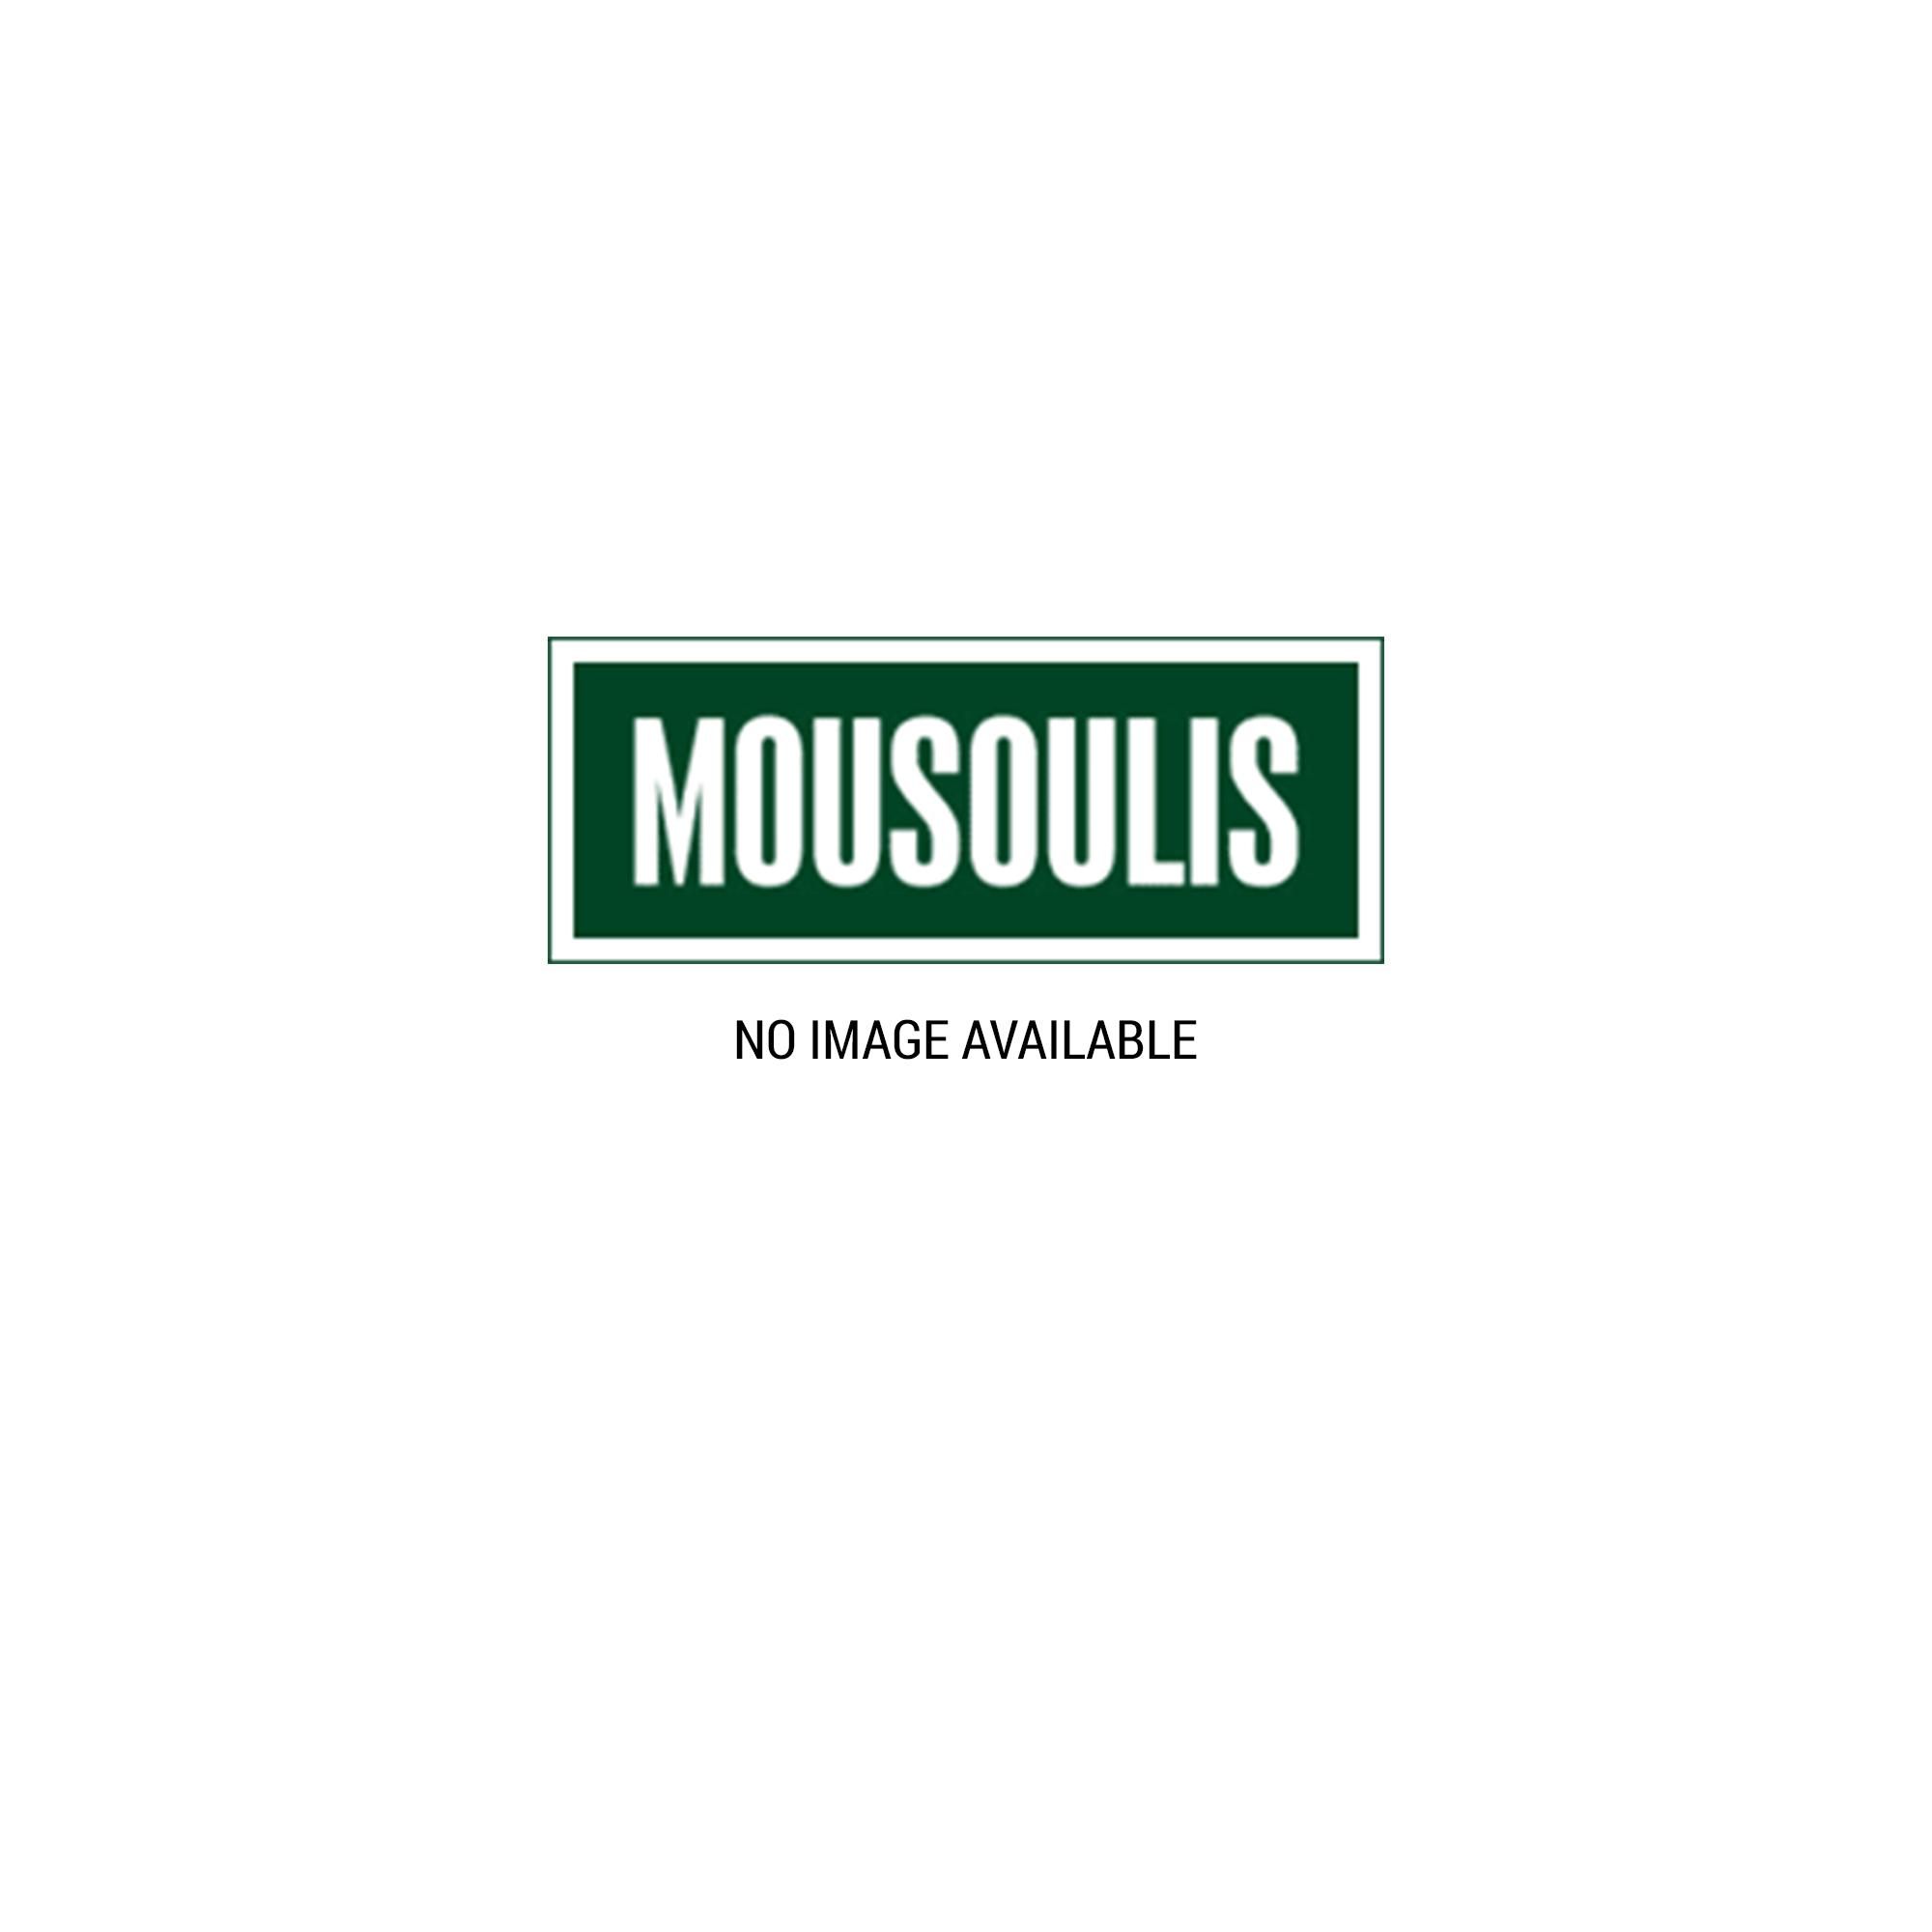 Hugo Boss Green Πουλόβερ Λαιμόκοψη Μάλλινο Μονόχρωμο Κανονική Γραμμή C-Cecil 01 50323595 Ανθρακί